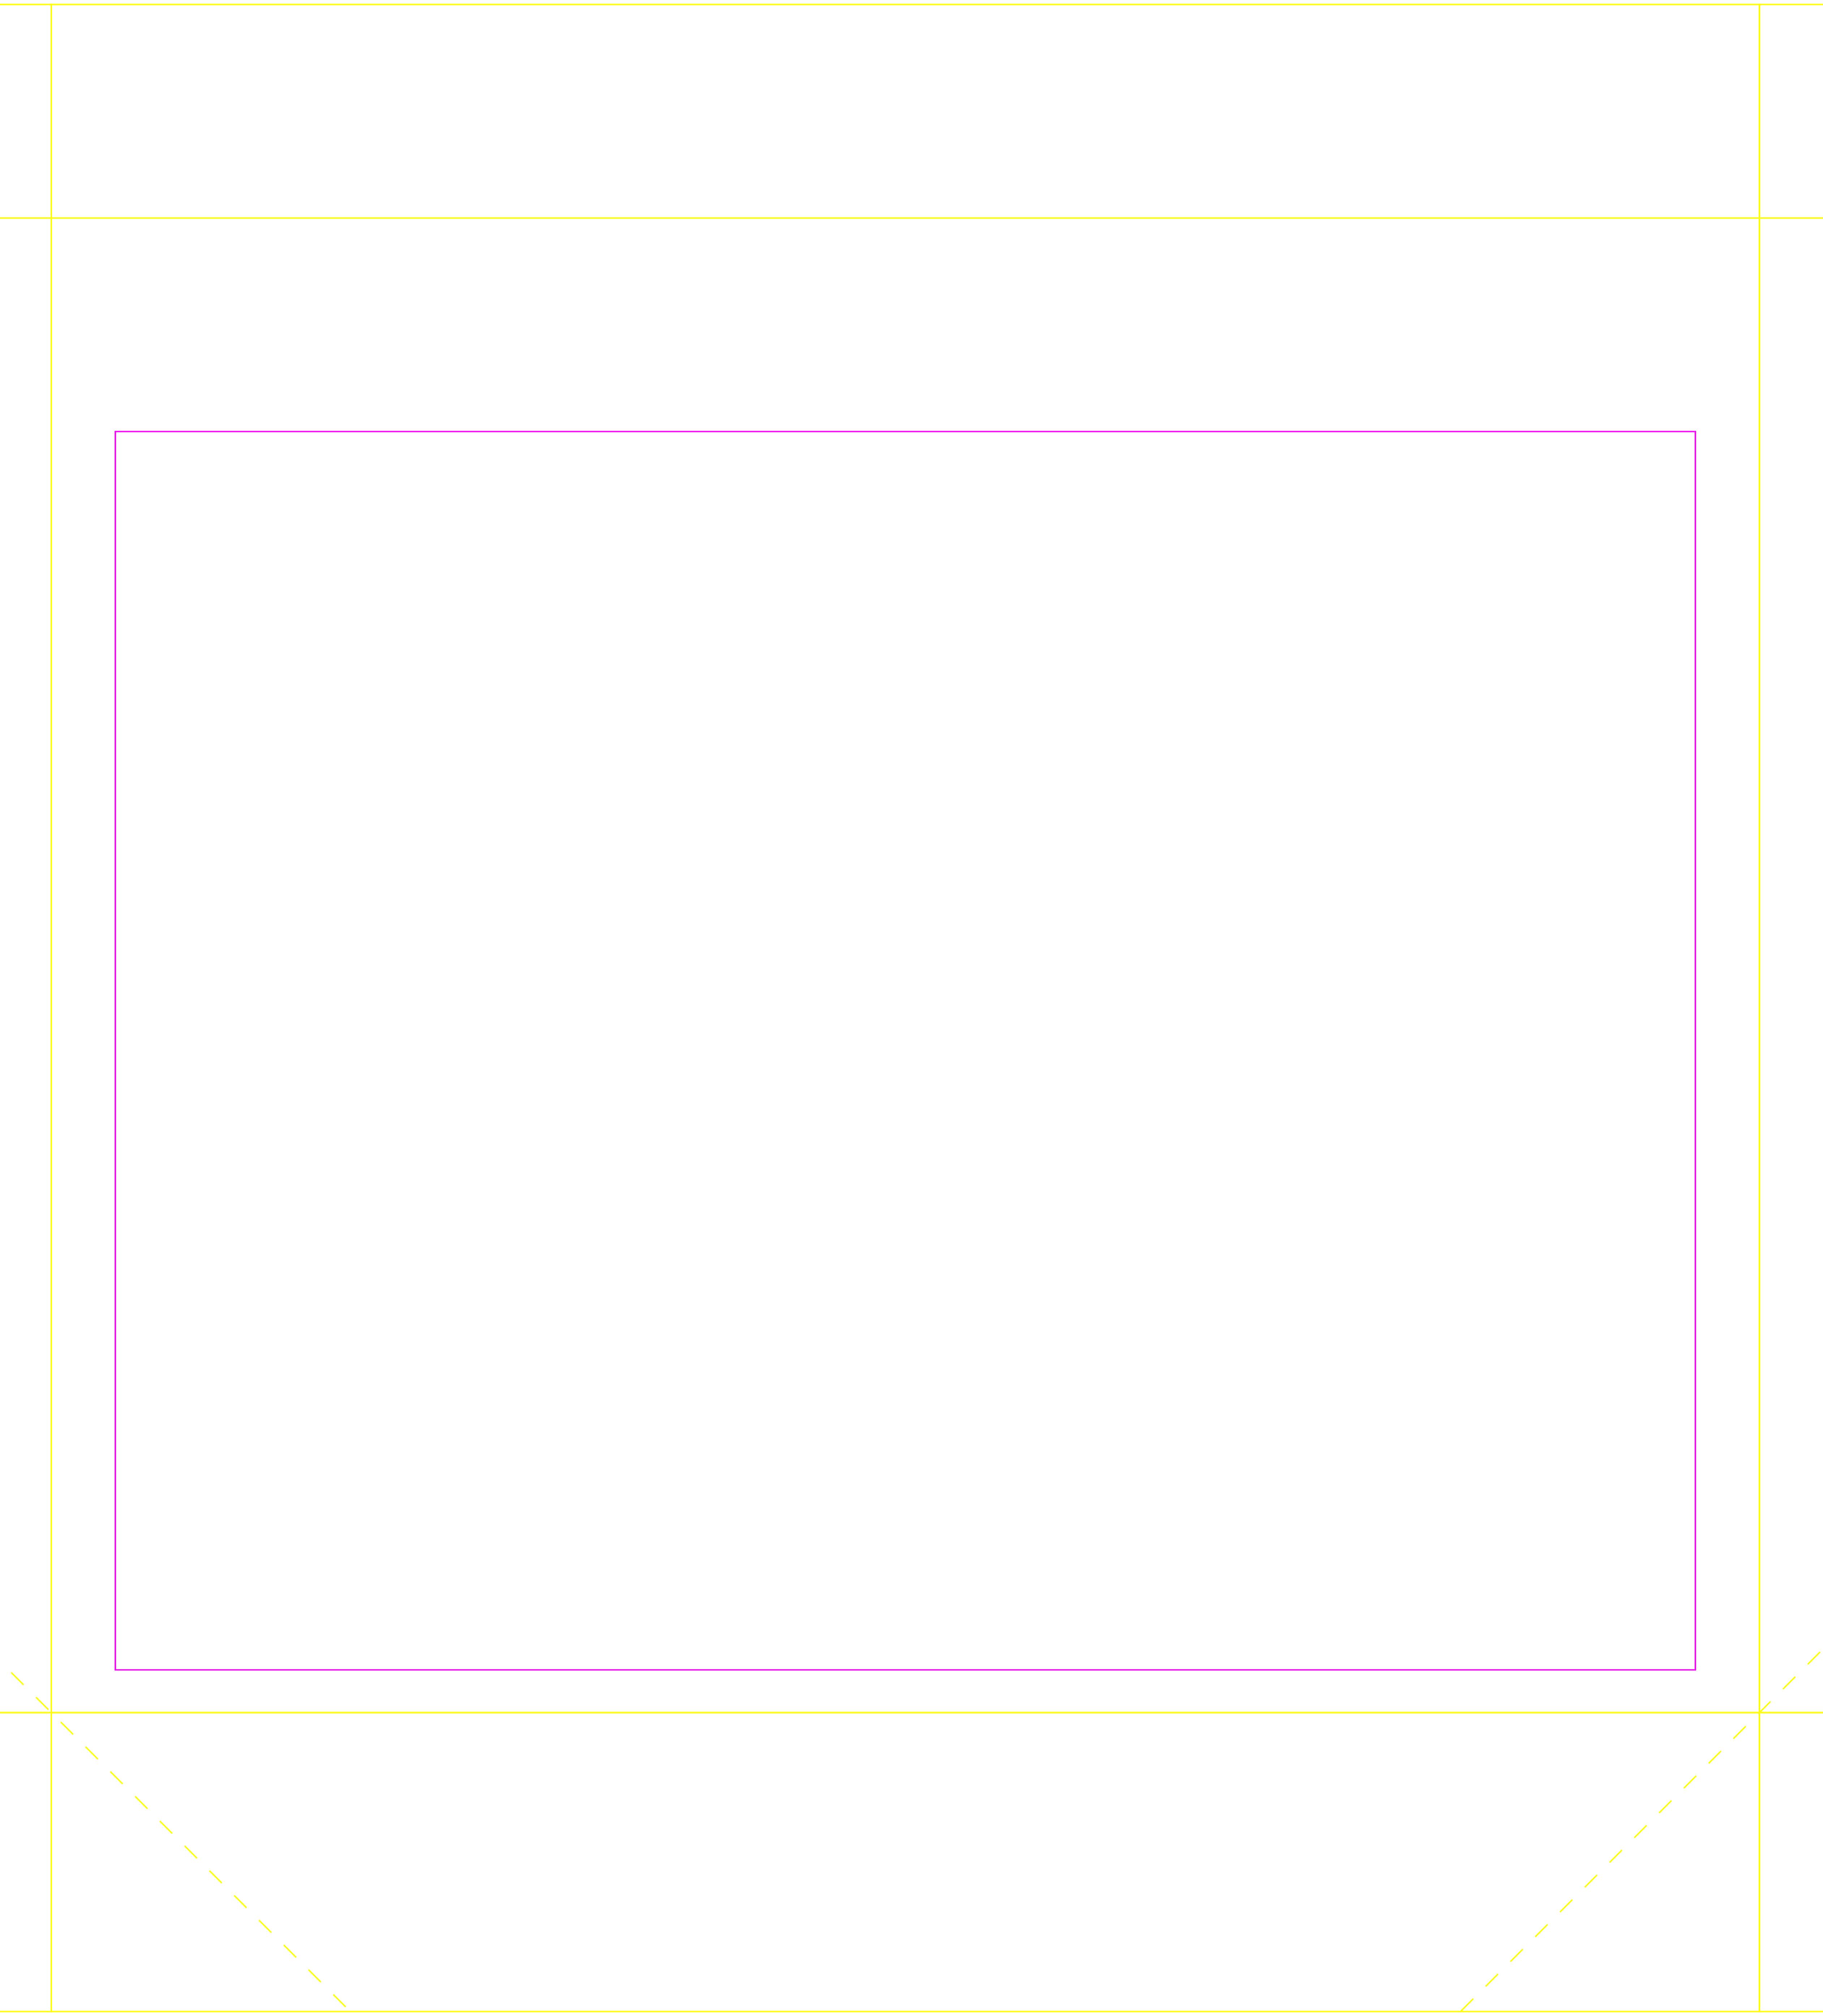 40_10x35cm_ze